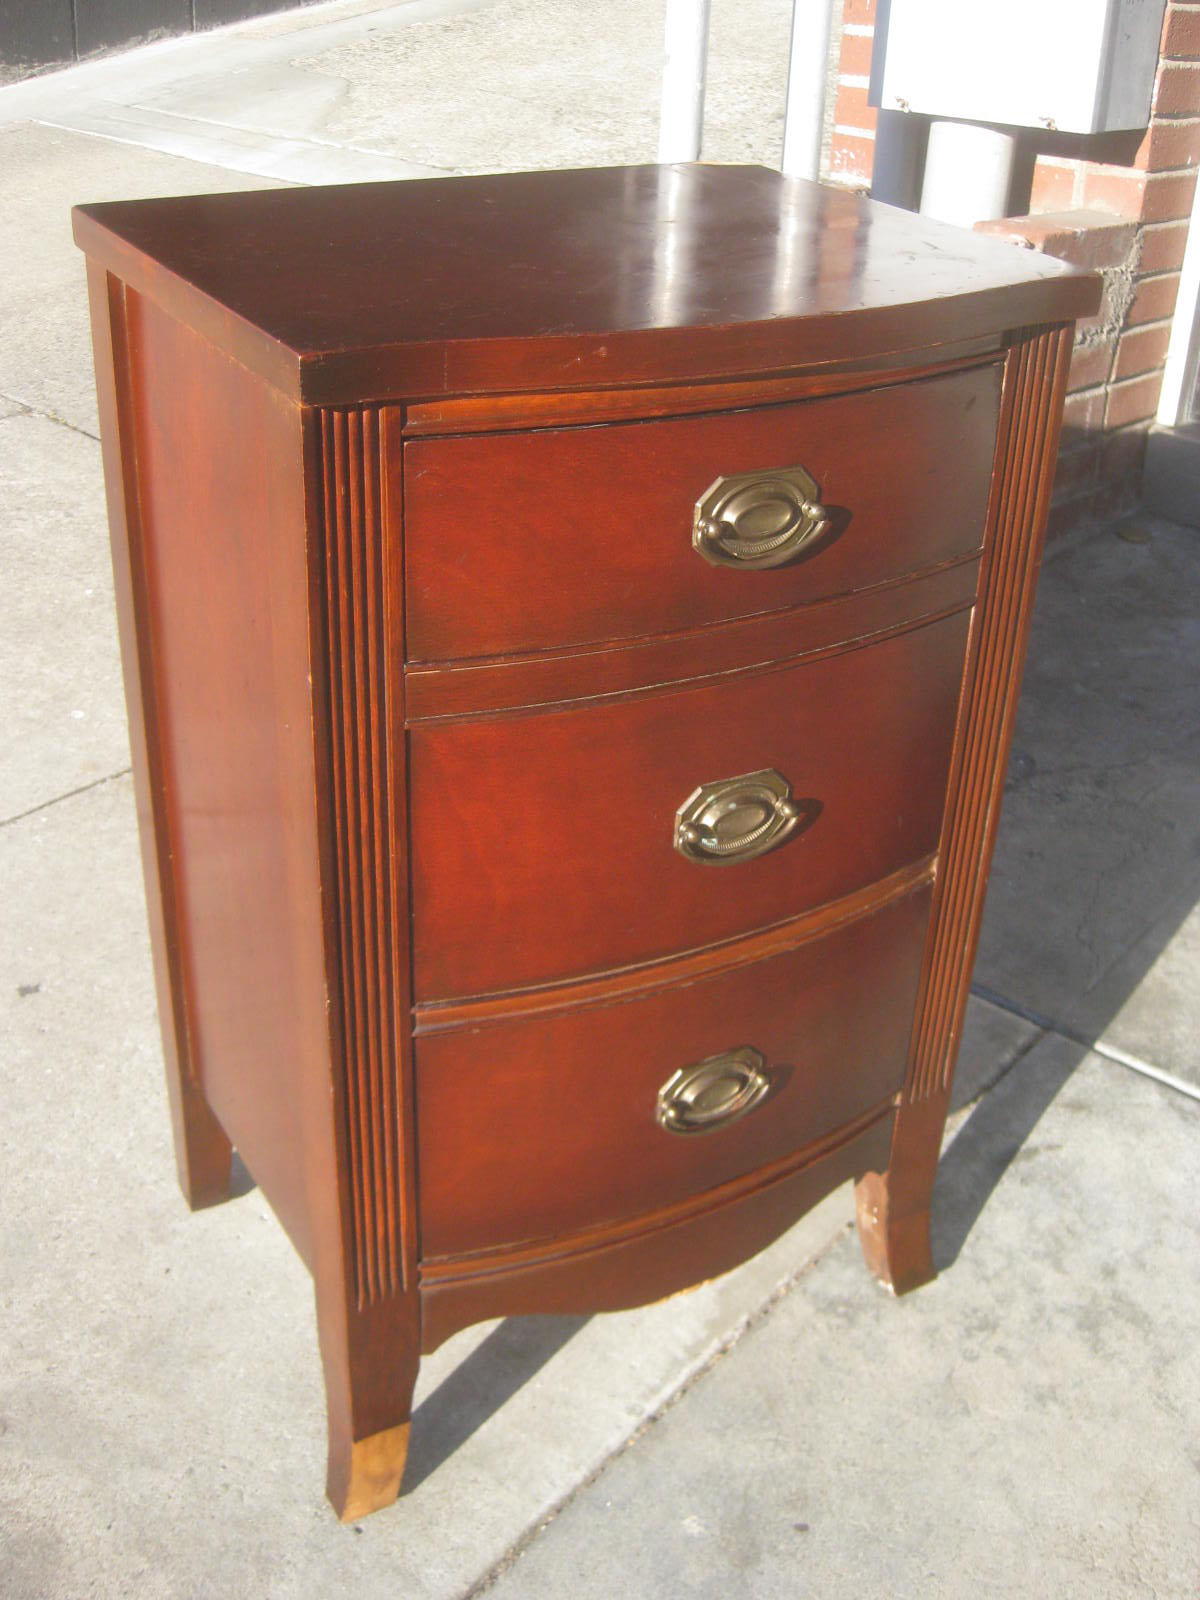 uhuru furniture collectibles sold mahogany night stand 45. Black Bedroom Furniture Sets. Home Design Ideas